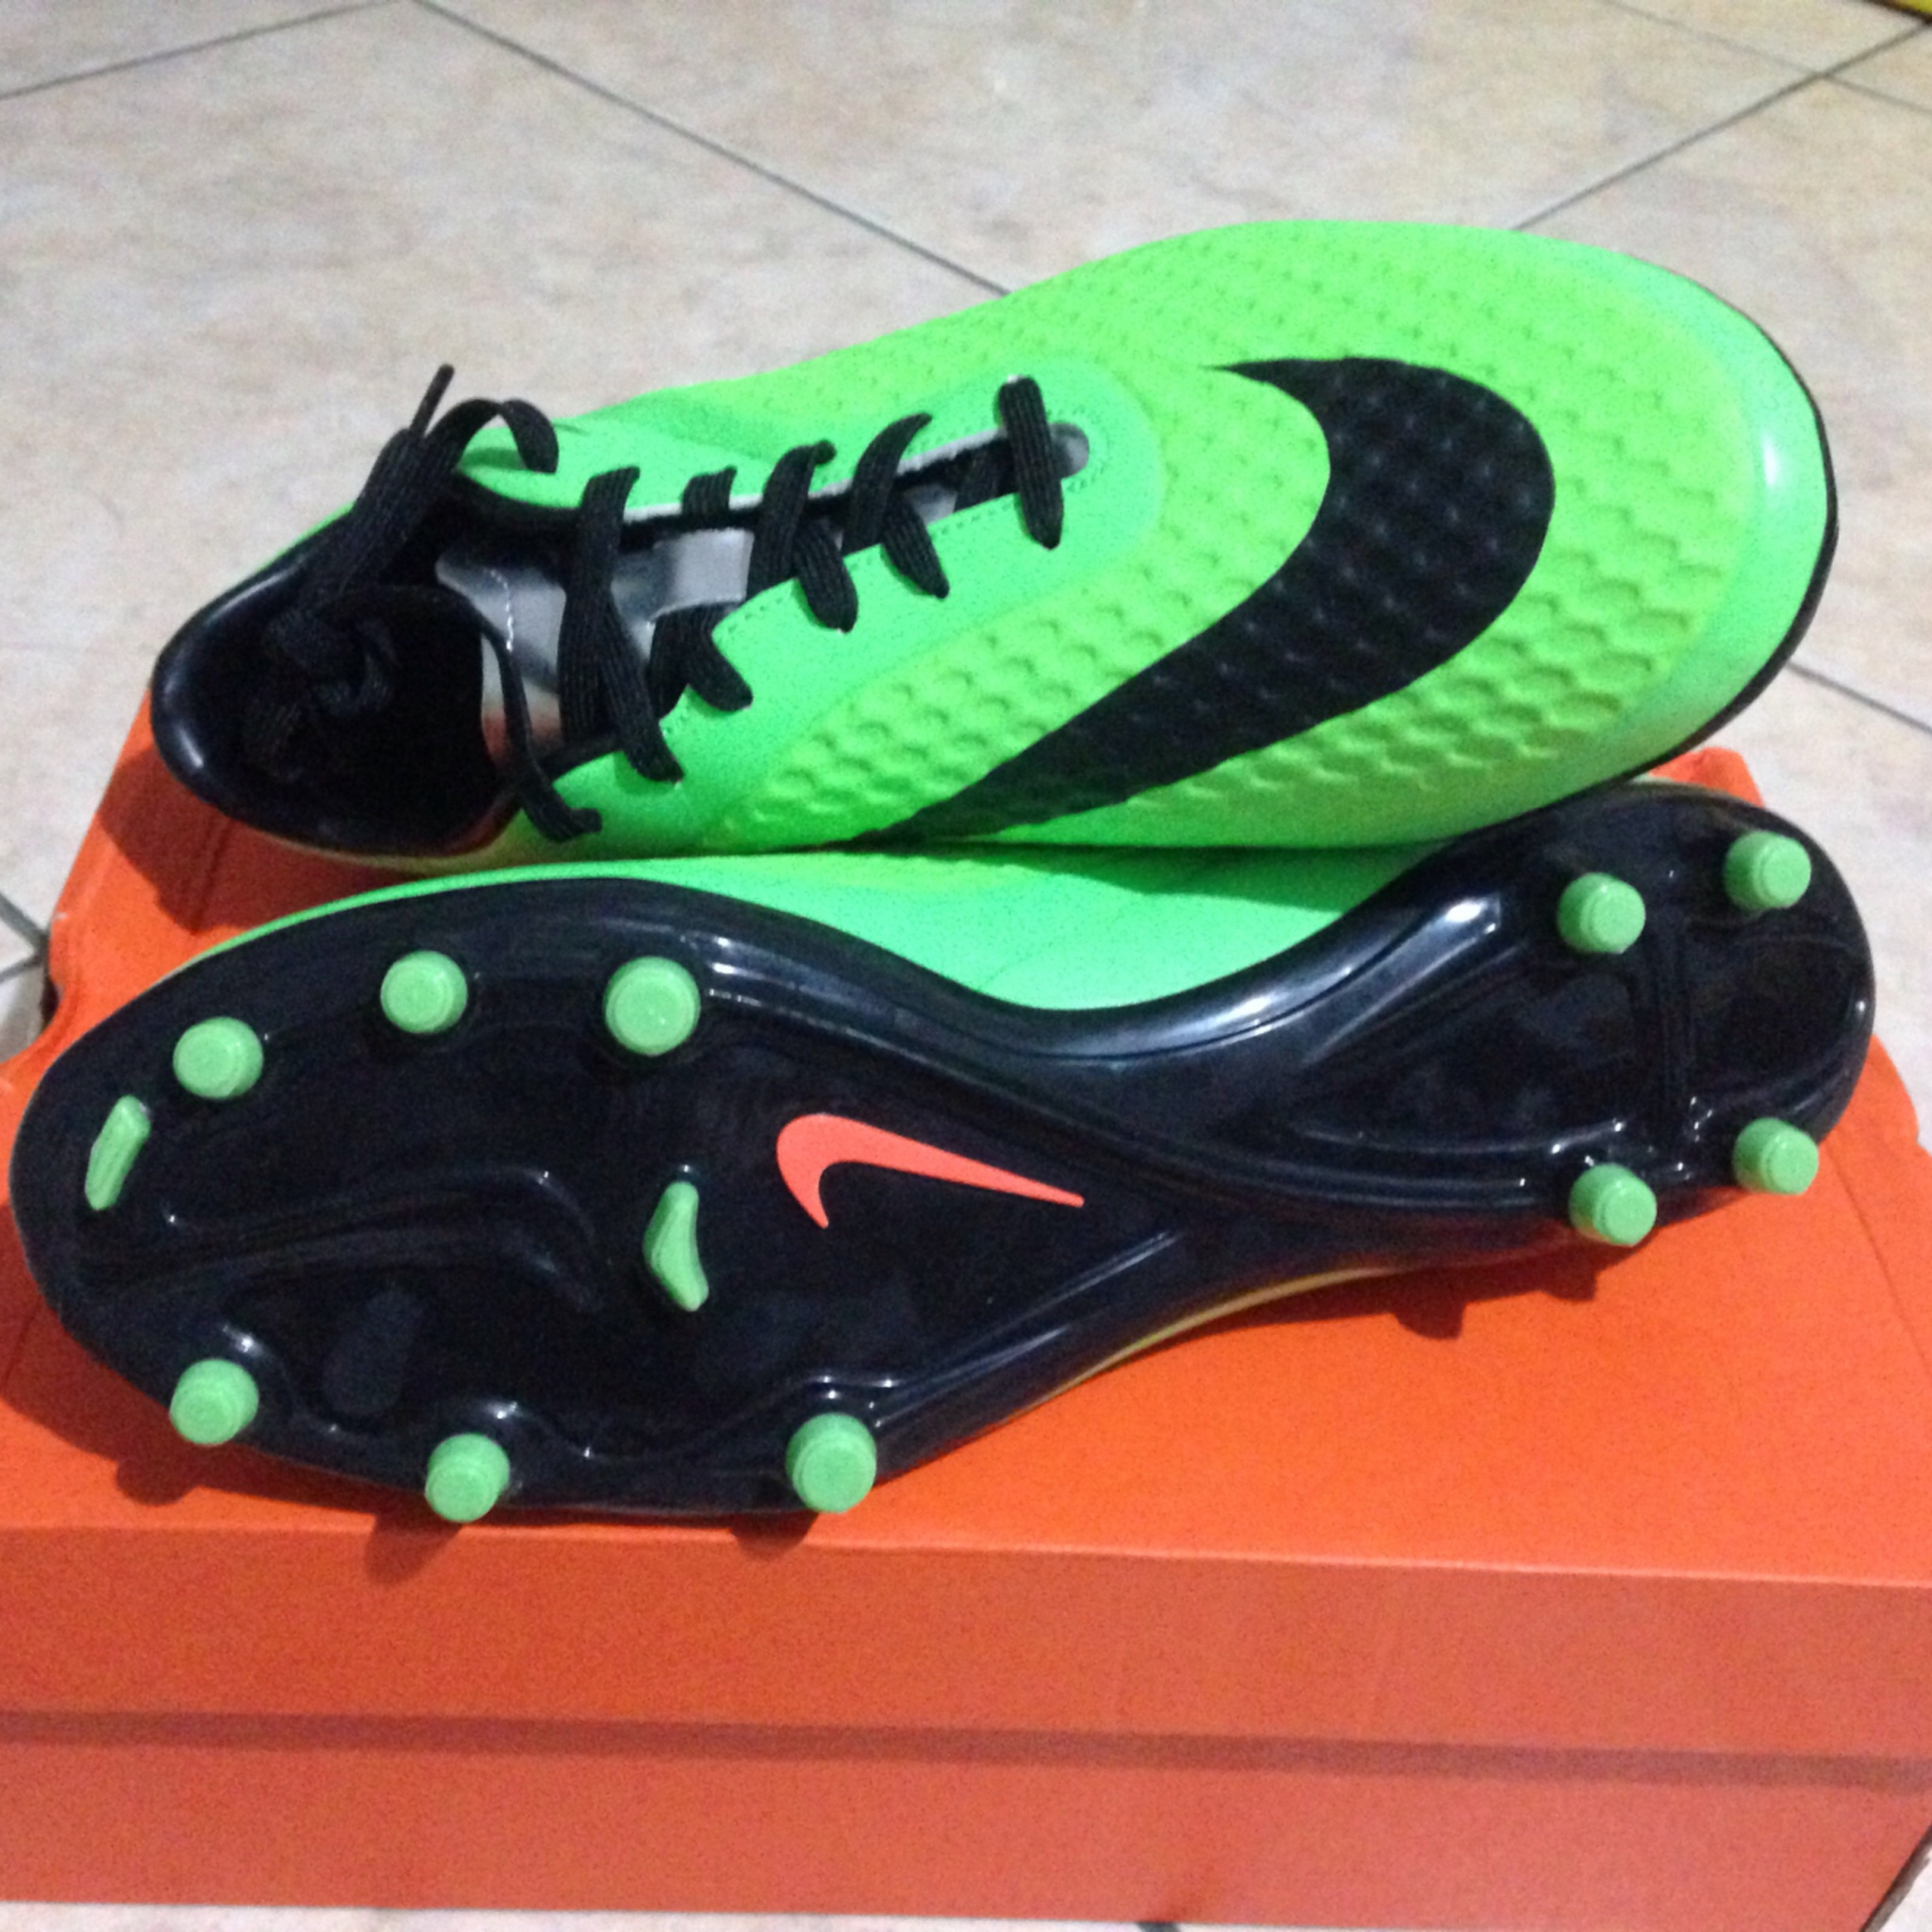 Keunggulan Nike Hypervenom Phelon 2016 Sepatu Futsal Ii Ic 749898 703 Hijau Volt Separu Bola Fg Size 42